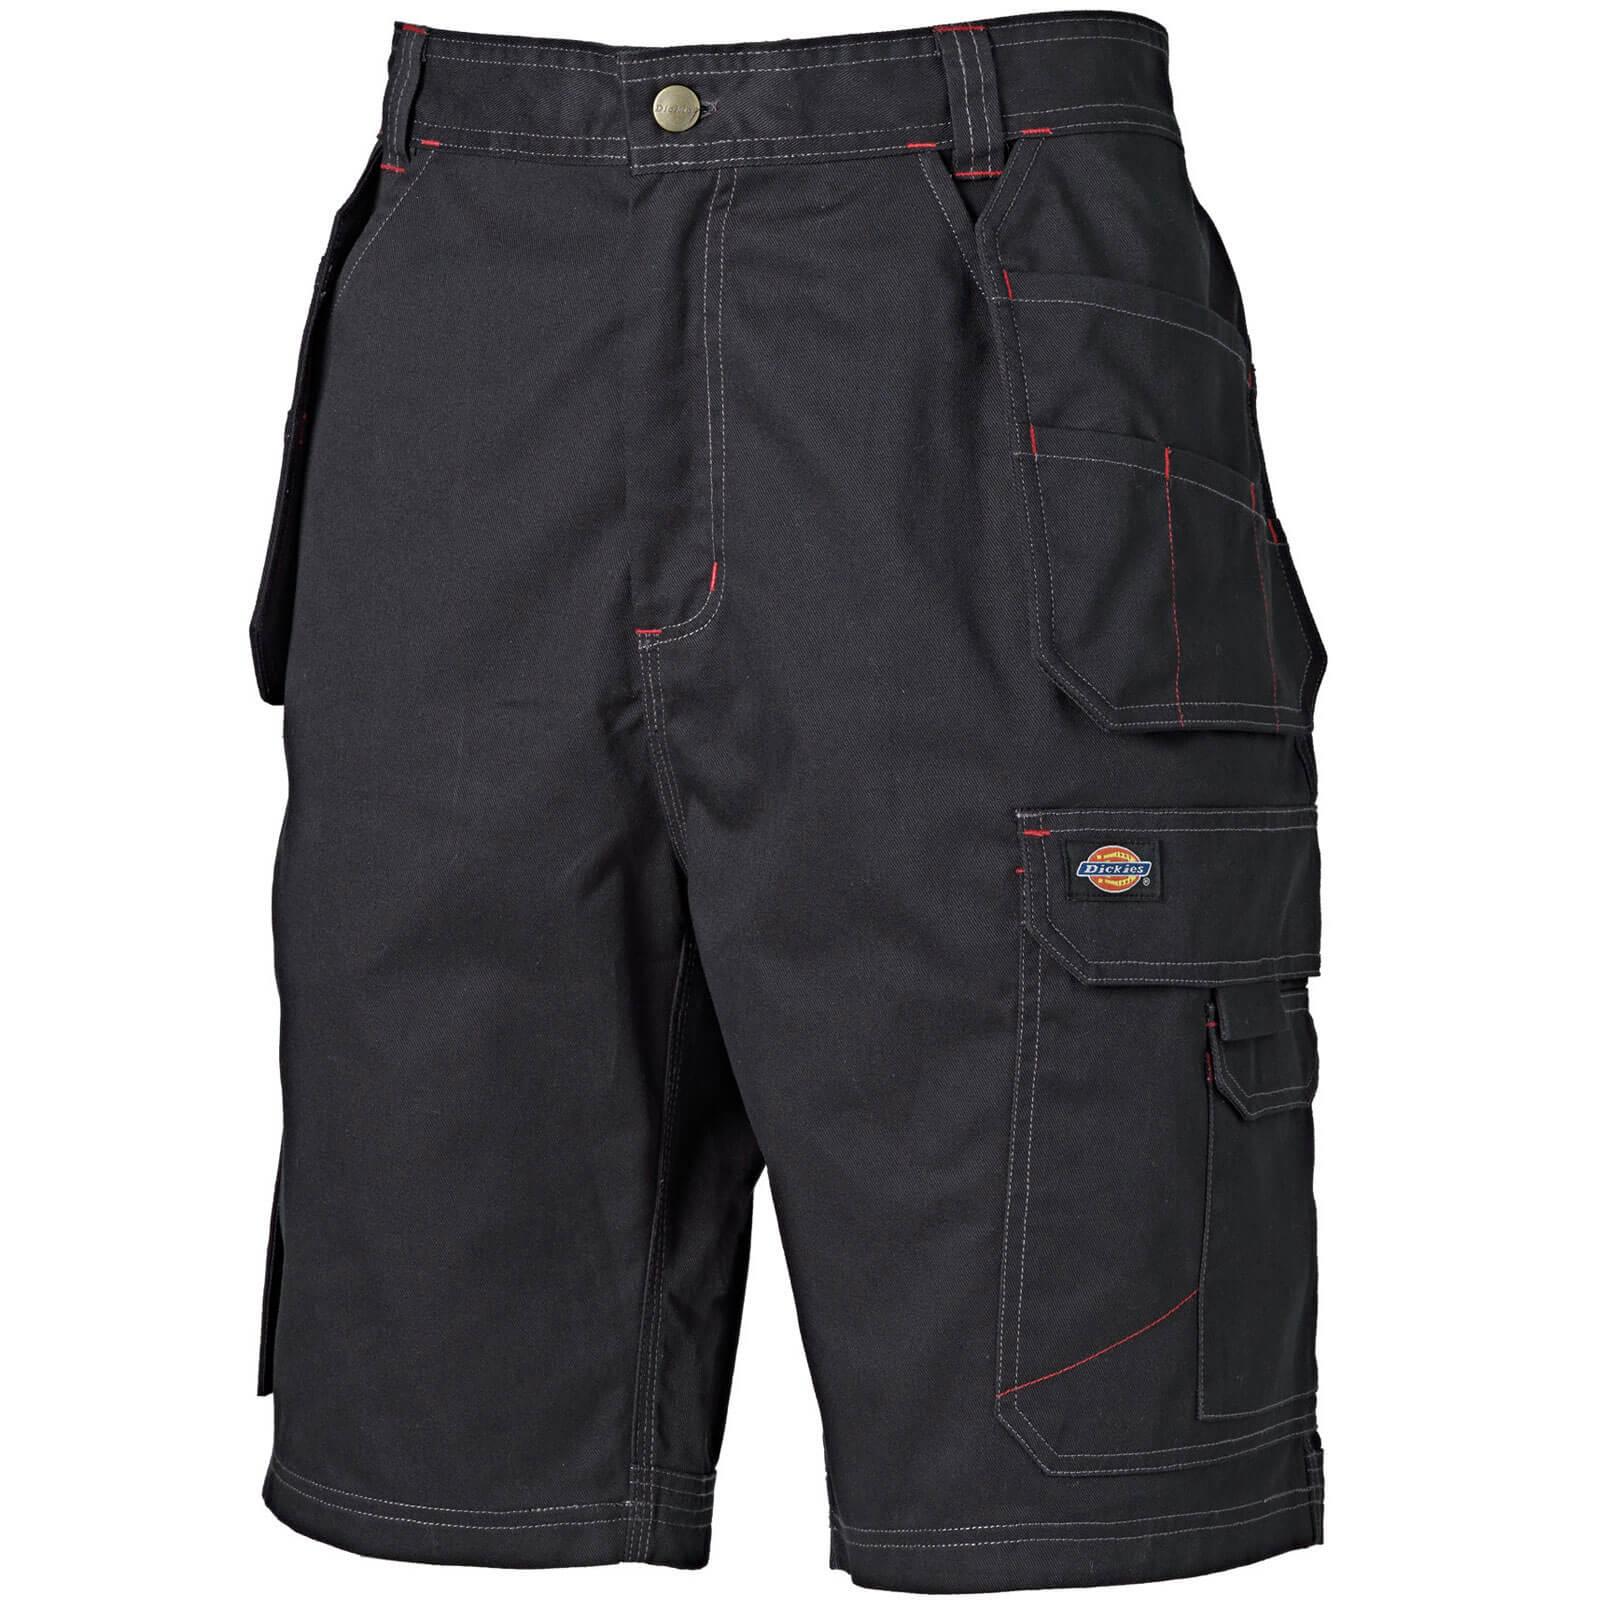 Dickies Redhawk Pro Shorts Black 28